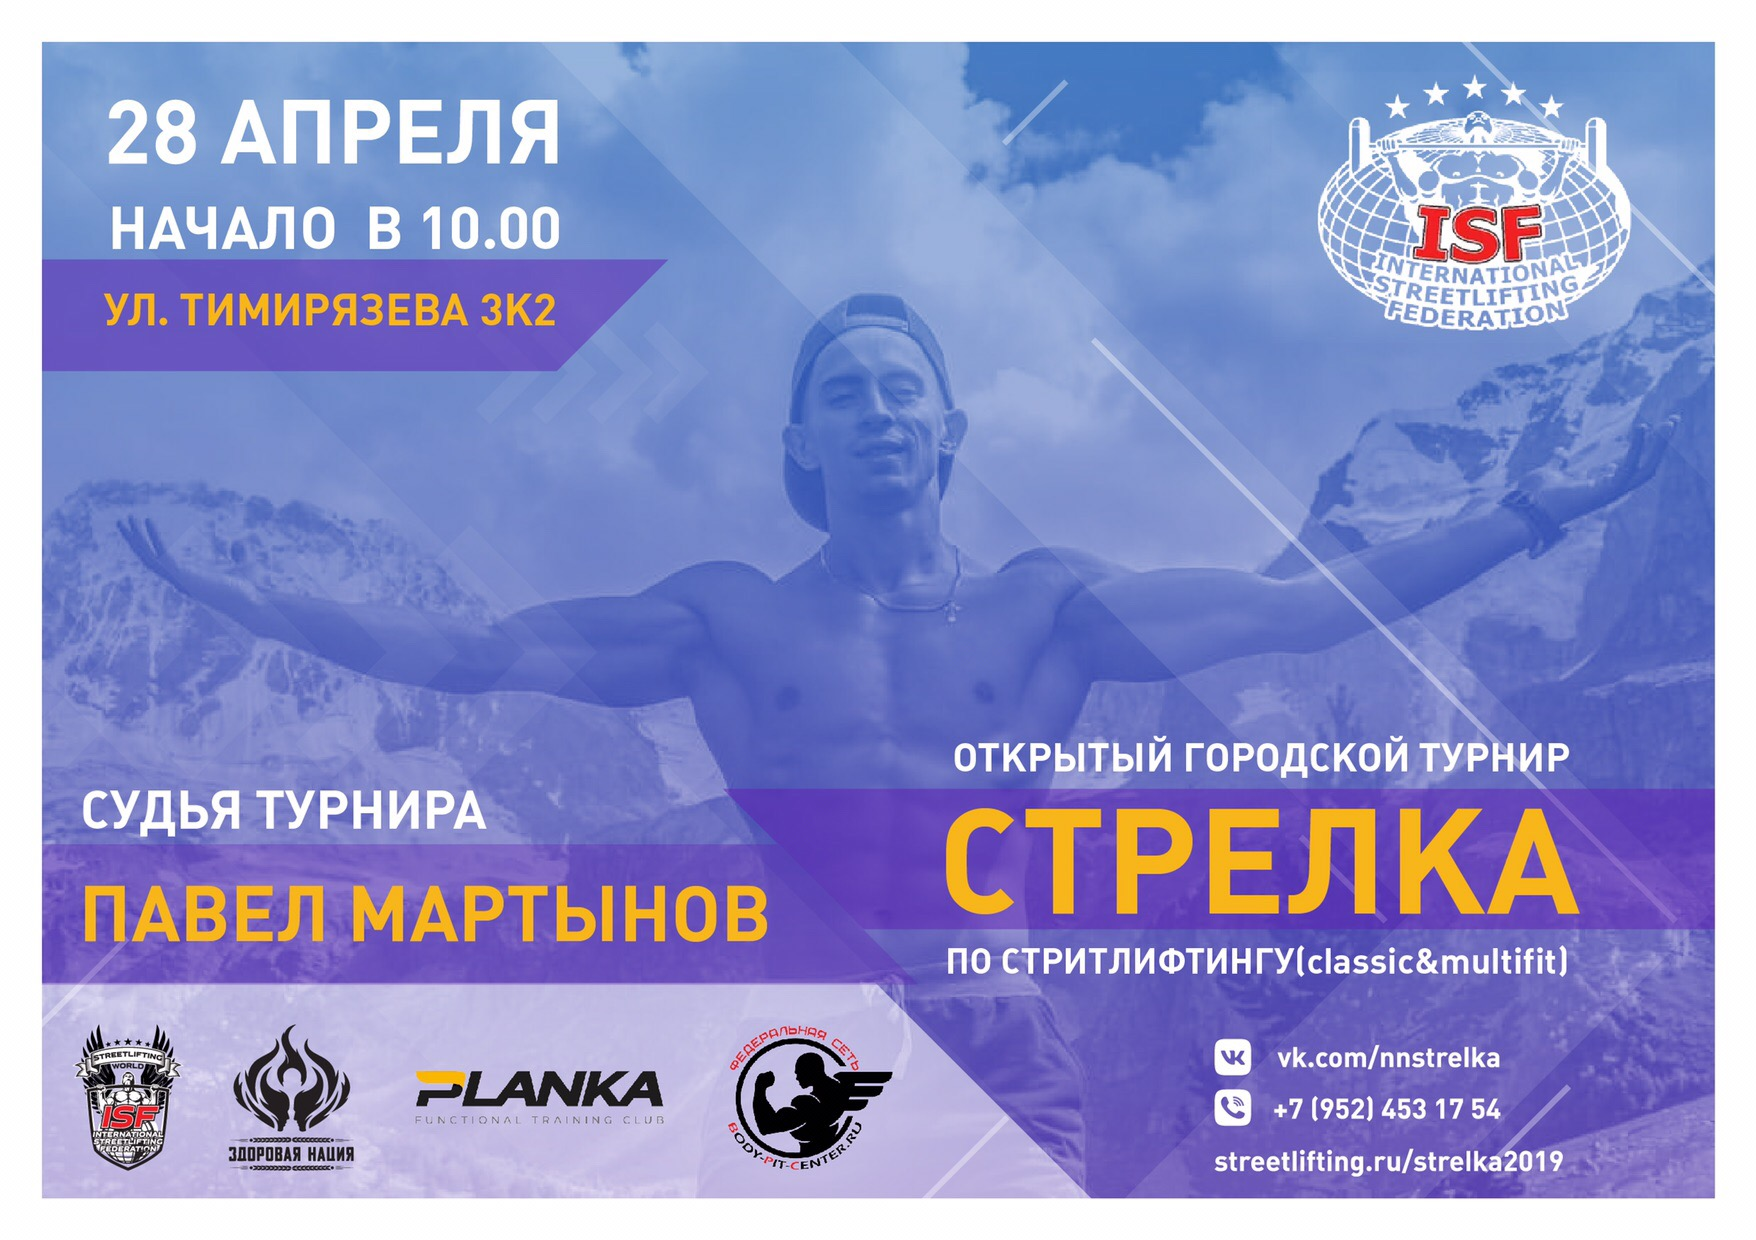 28 апреля 2019 – Открытый турнир «Стрелка» по стритлифтингу, г. Нижний Новгород (К, М)